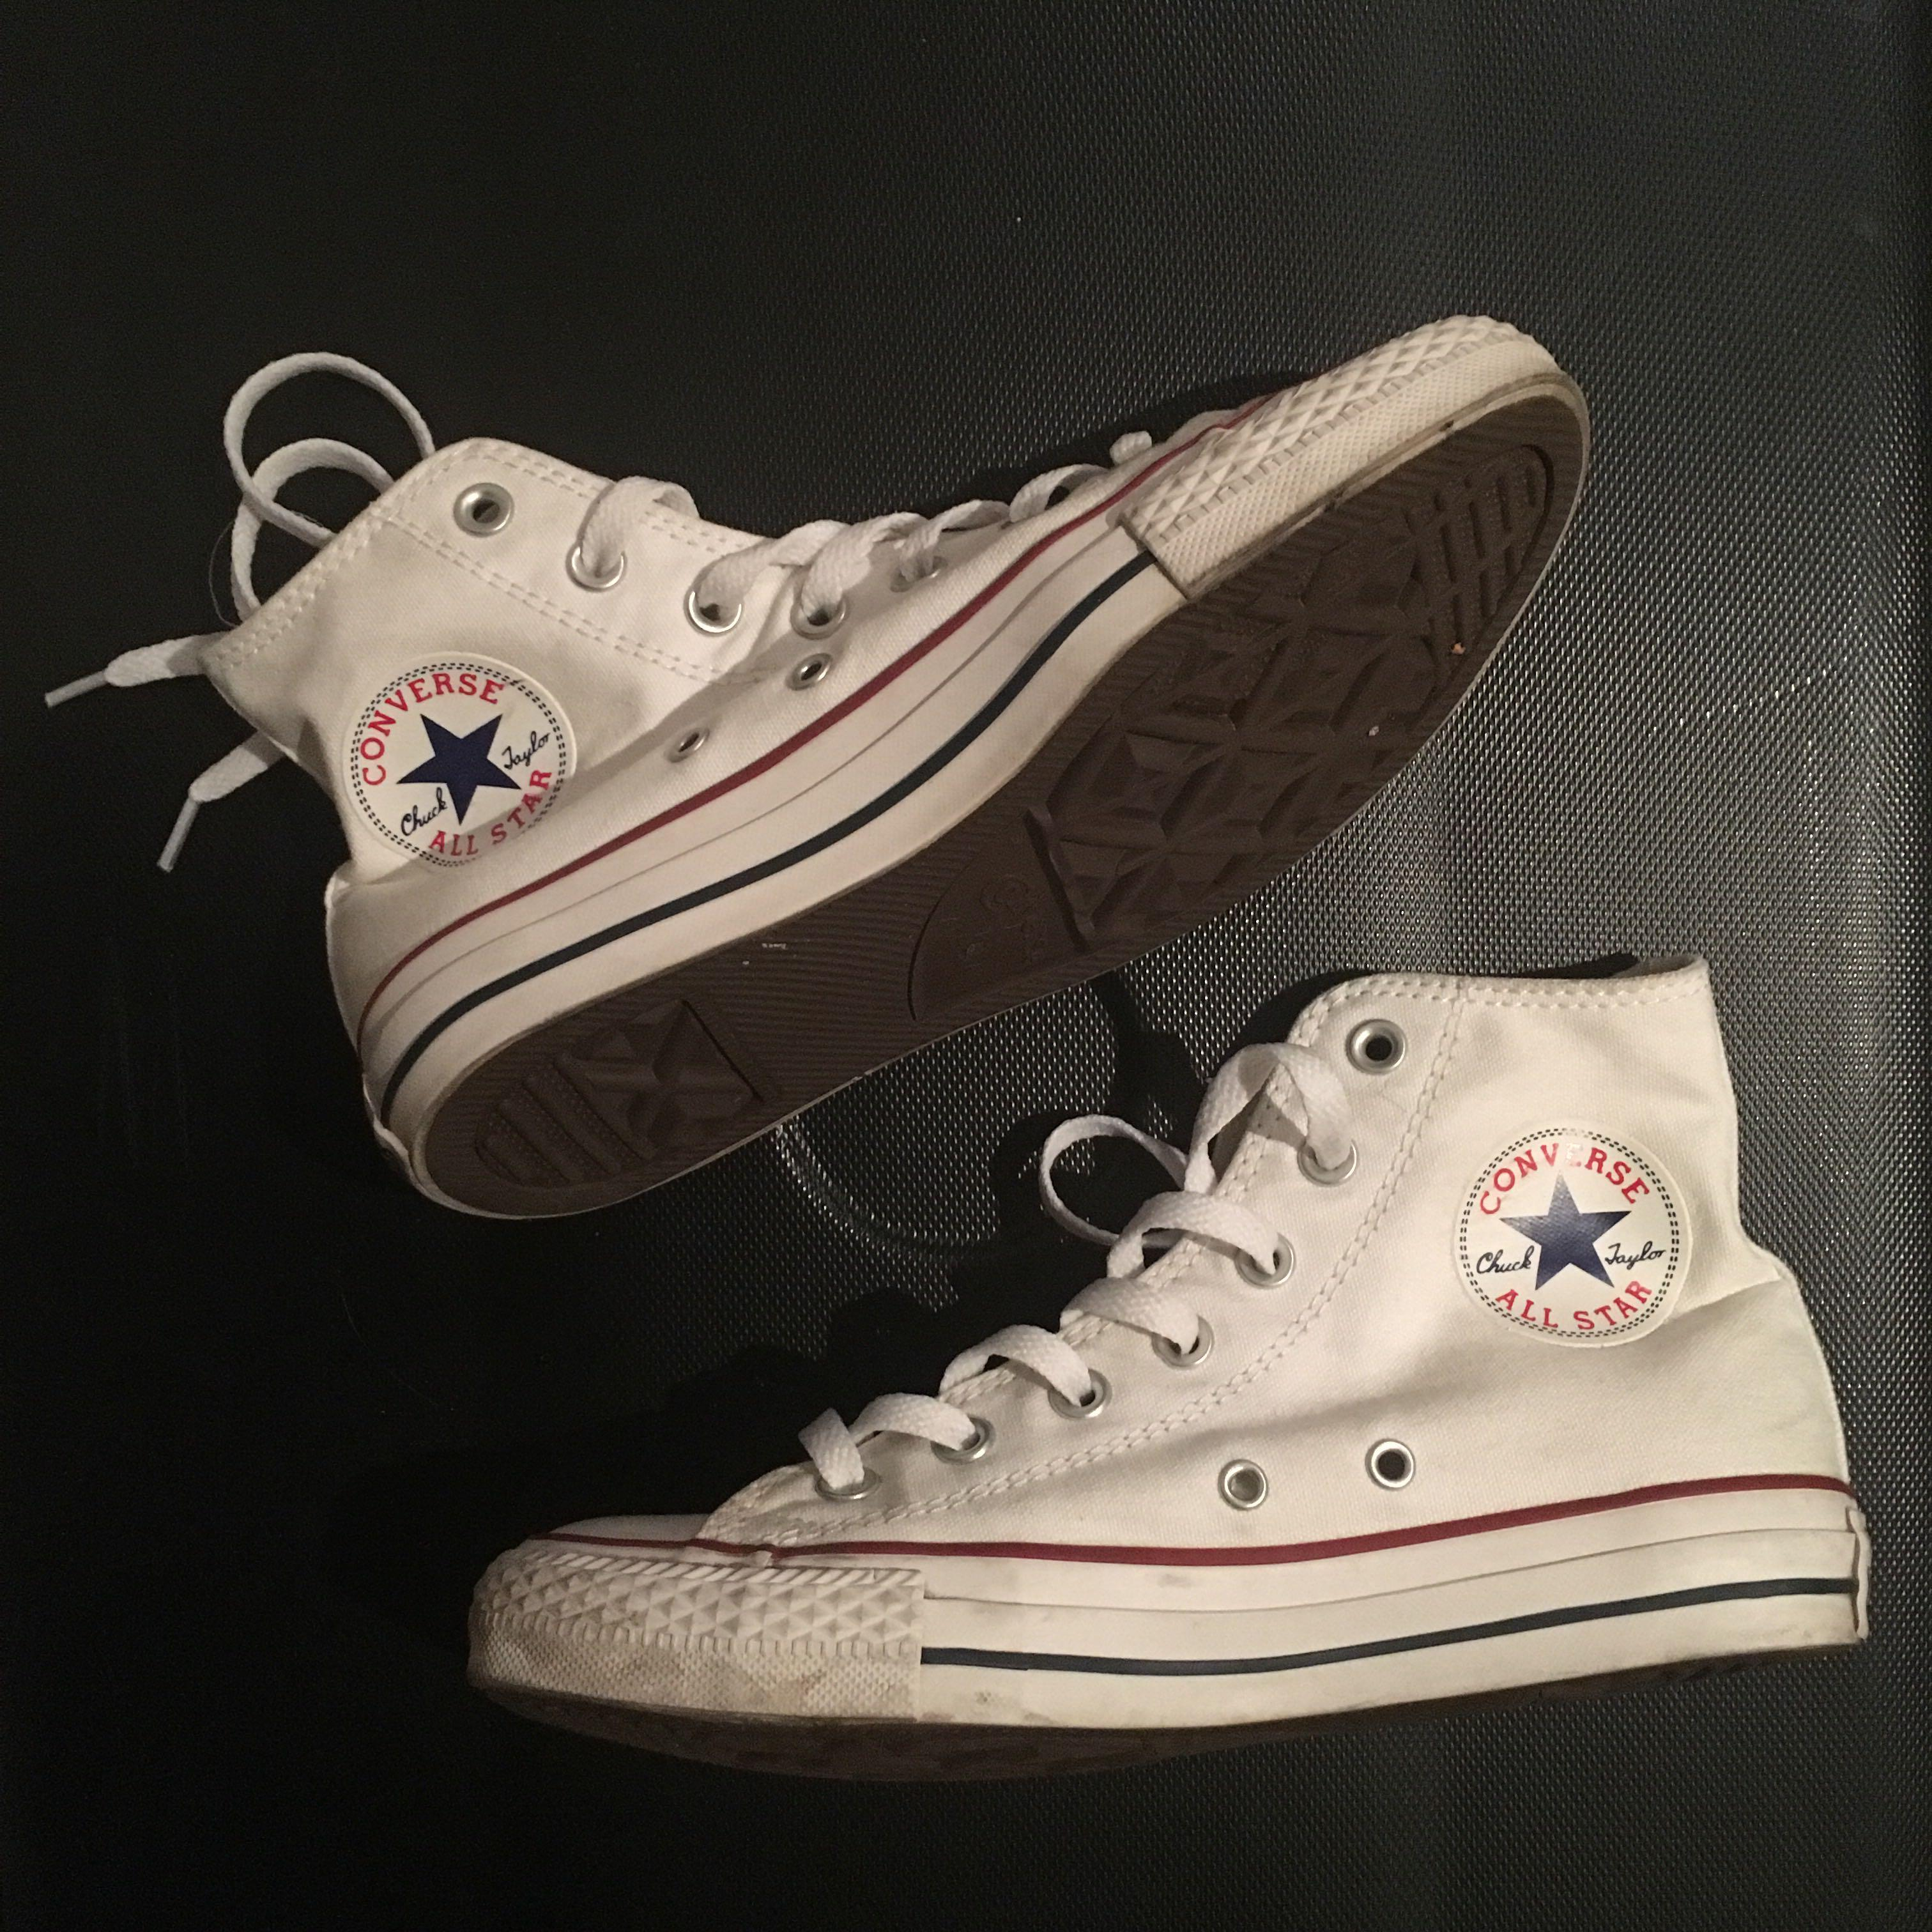 Top White All Taylor Converse Star Classic Chuck Colour High jUVpGLSMqz